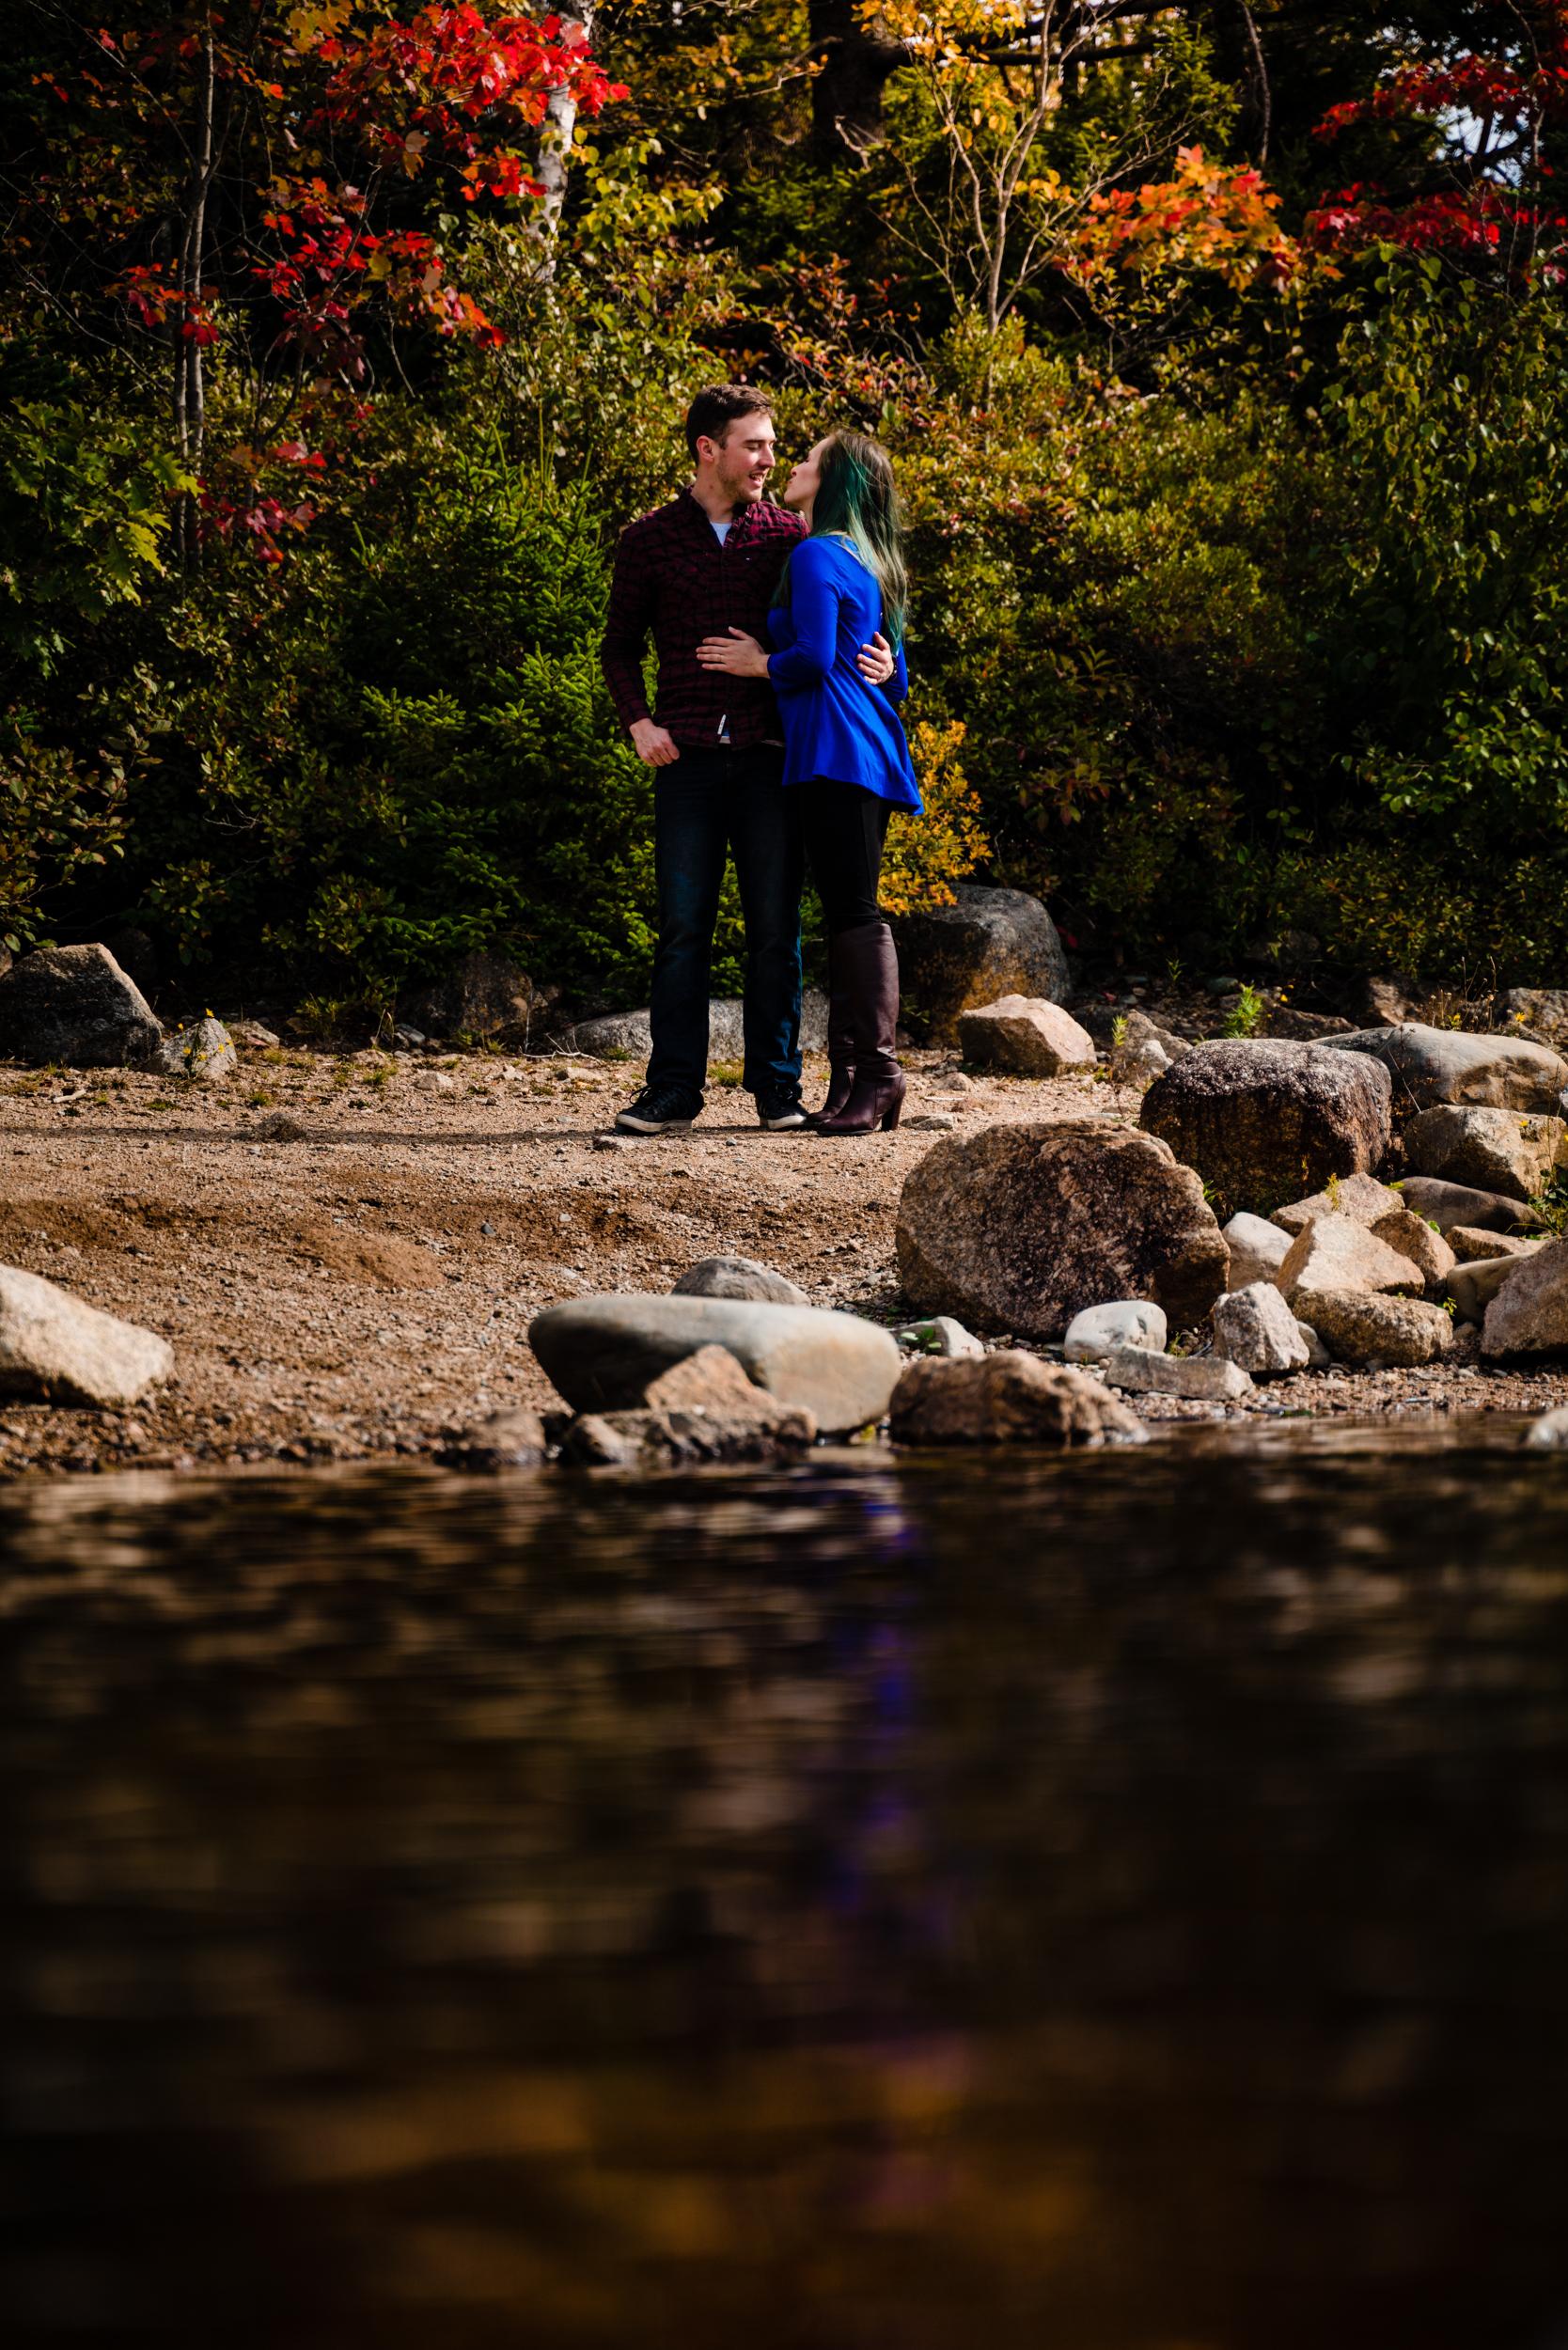 Halifax-engagement-nova-scotia-ottawa-ontario-arcade-longlake-Fall-Autumn (7 of 60).jpg